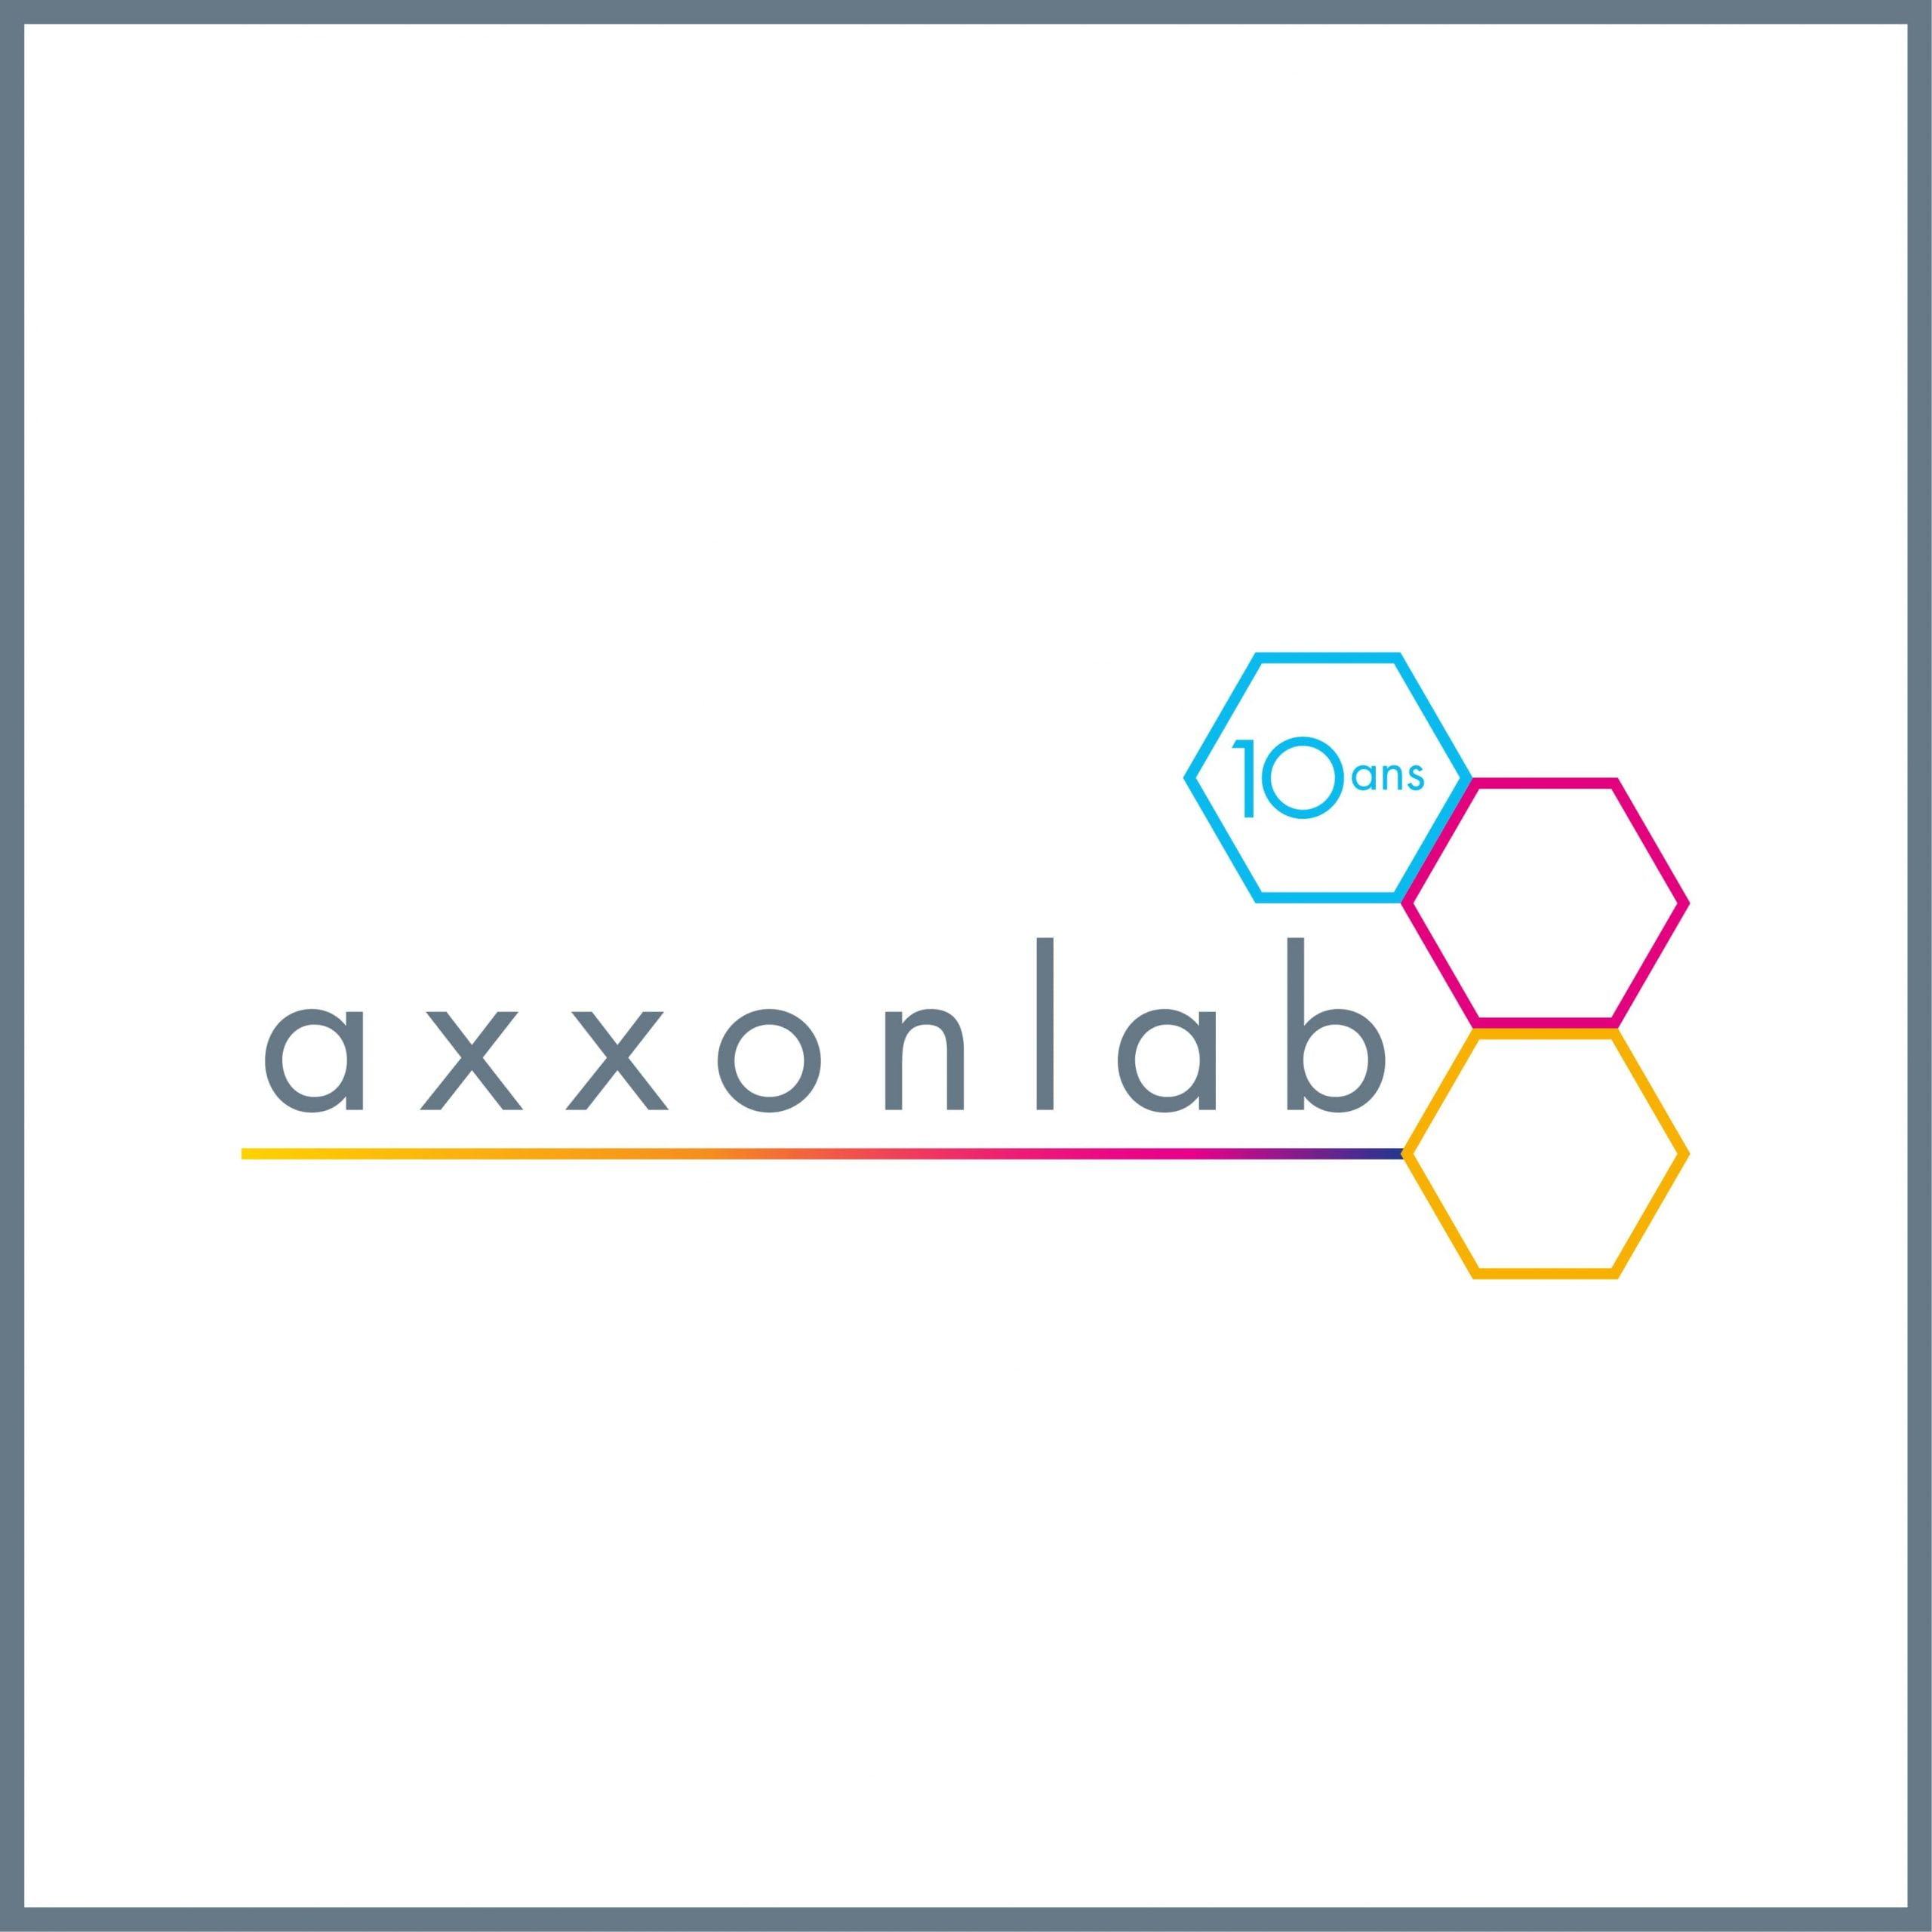 Axxonlab - Adaptation de logo